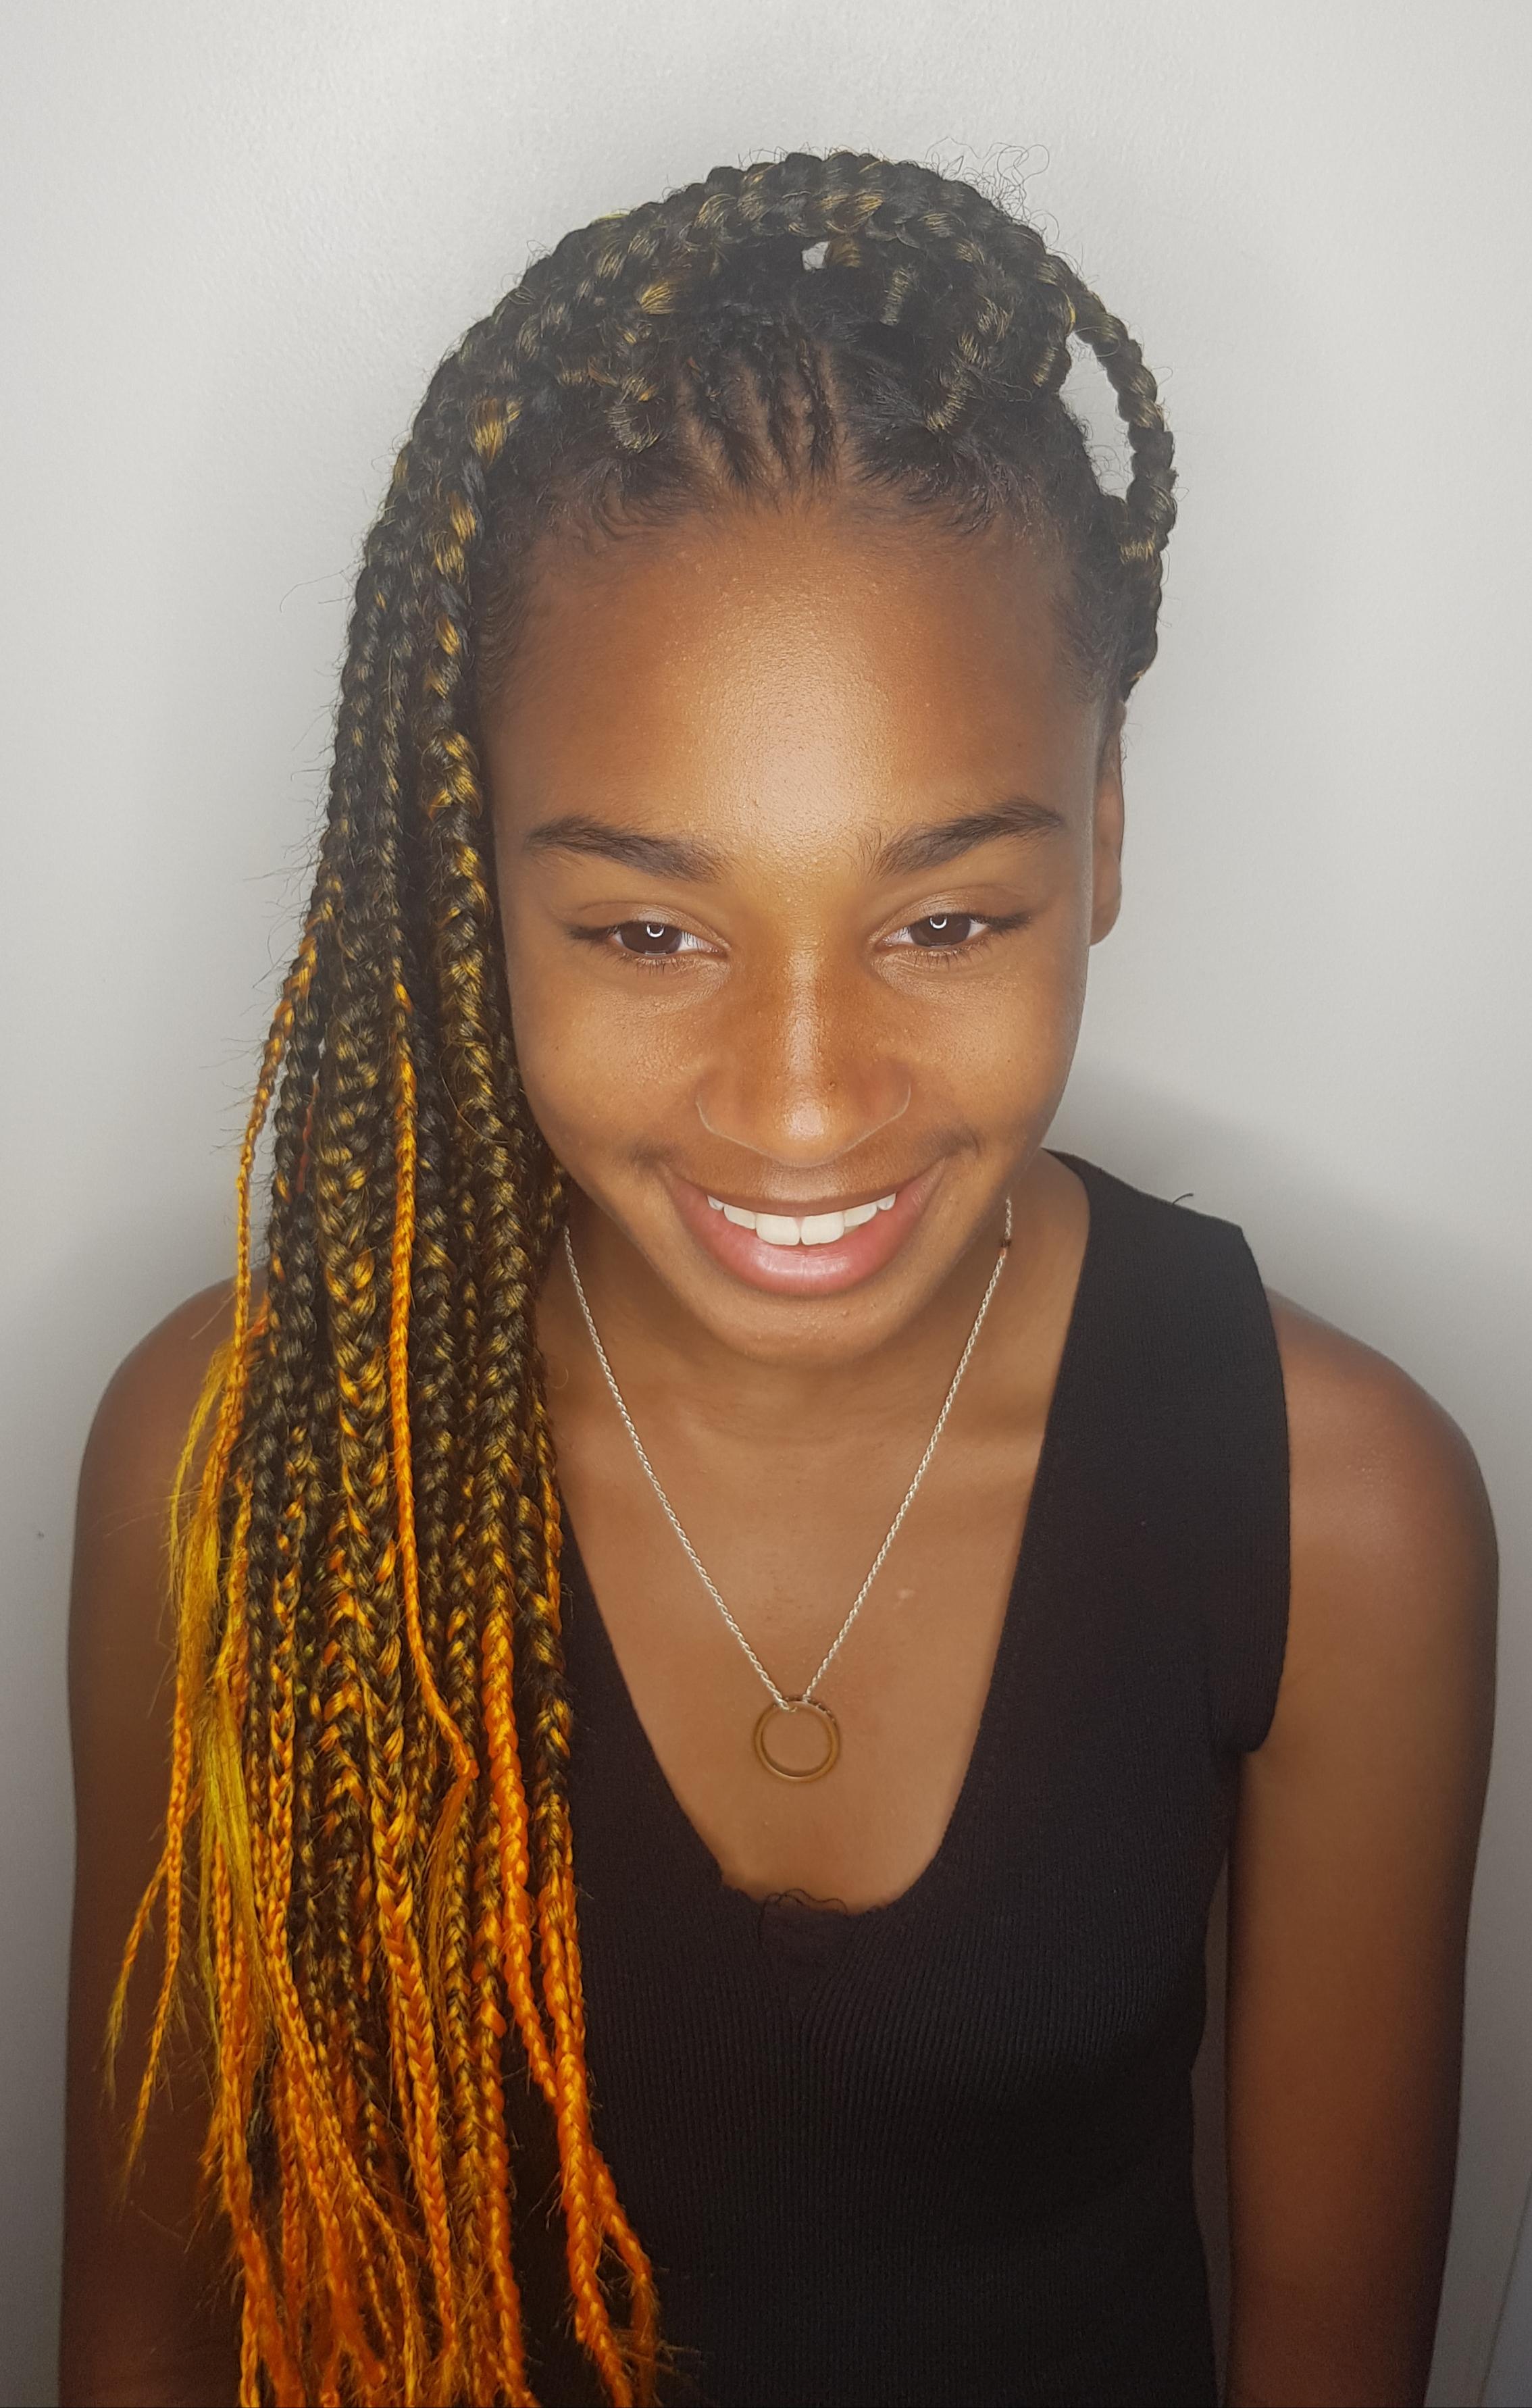 salon de coiffure afro tresse tresses box braids crochet braids vanilles tissages paris 75 77 78 91 92 93 94 95 IQNVAXDA